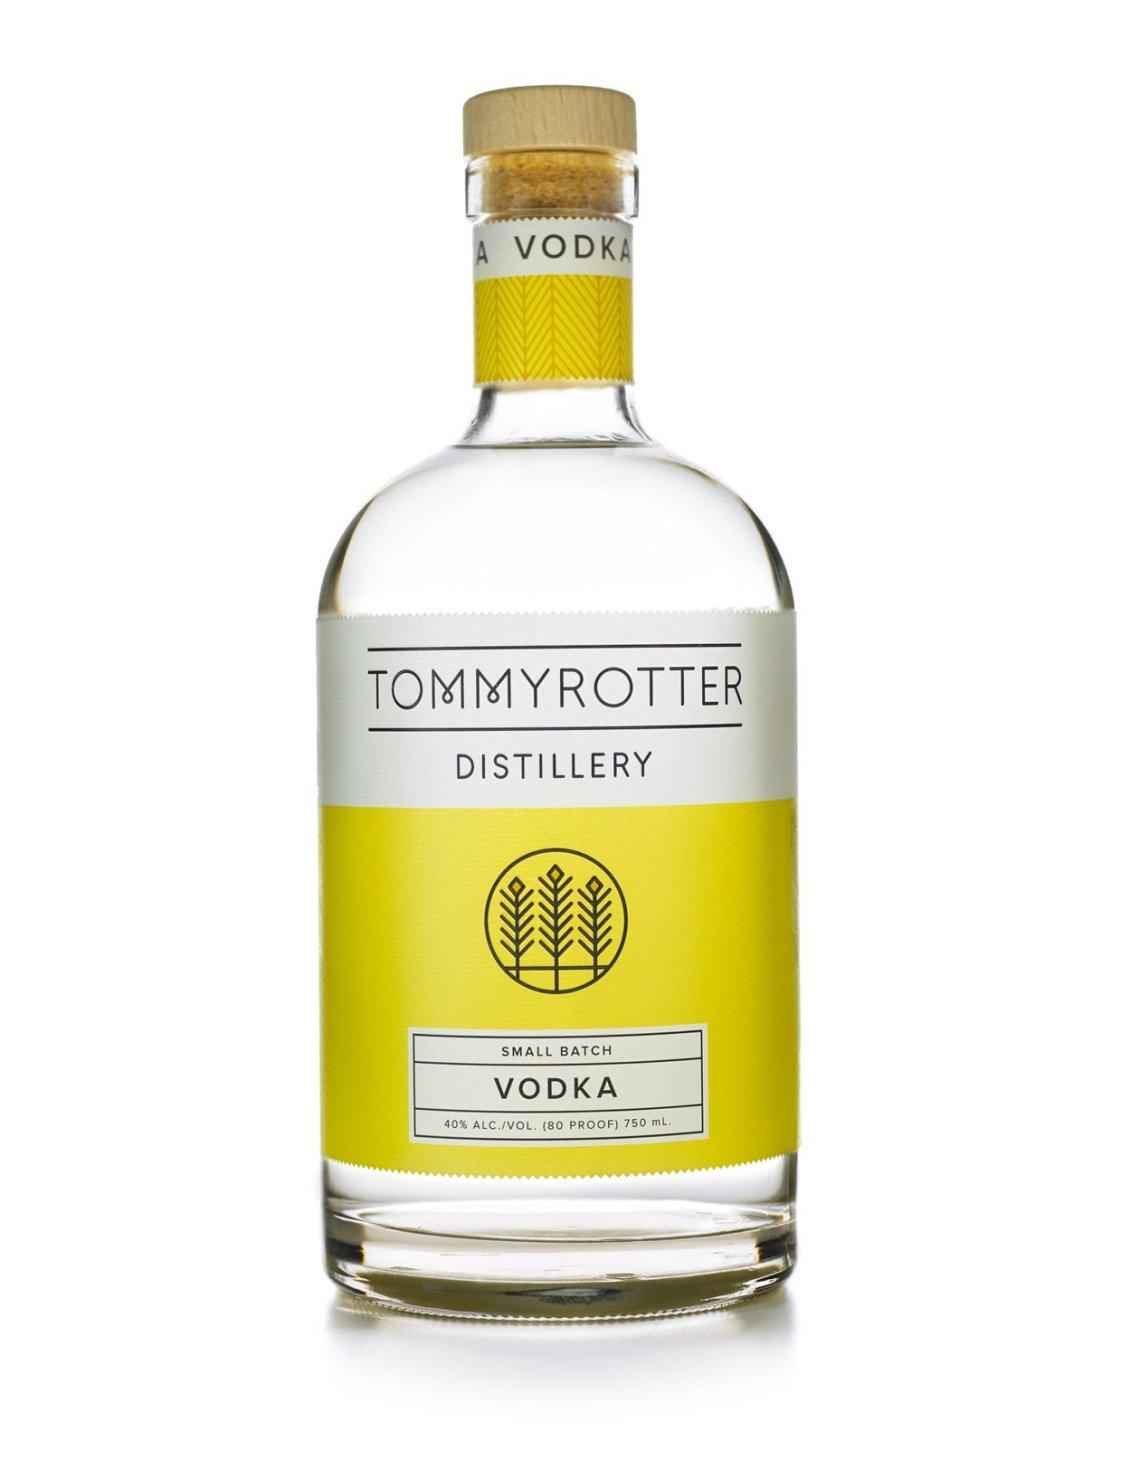 Tommyrotter Vodka